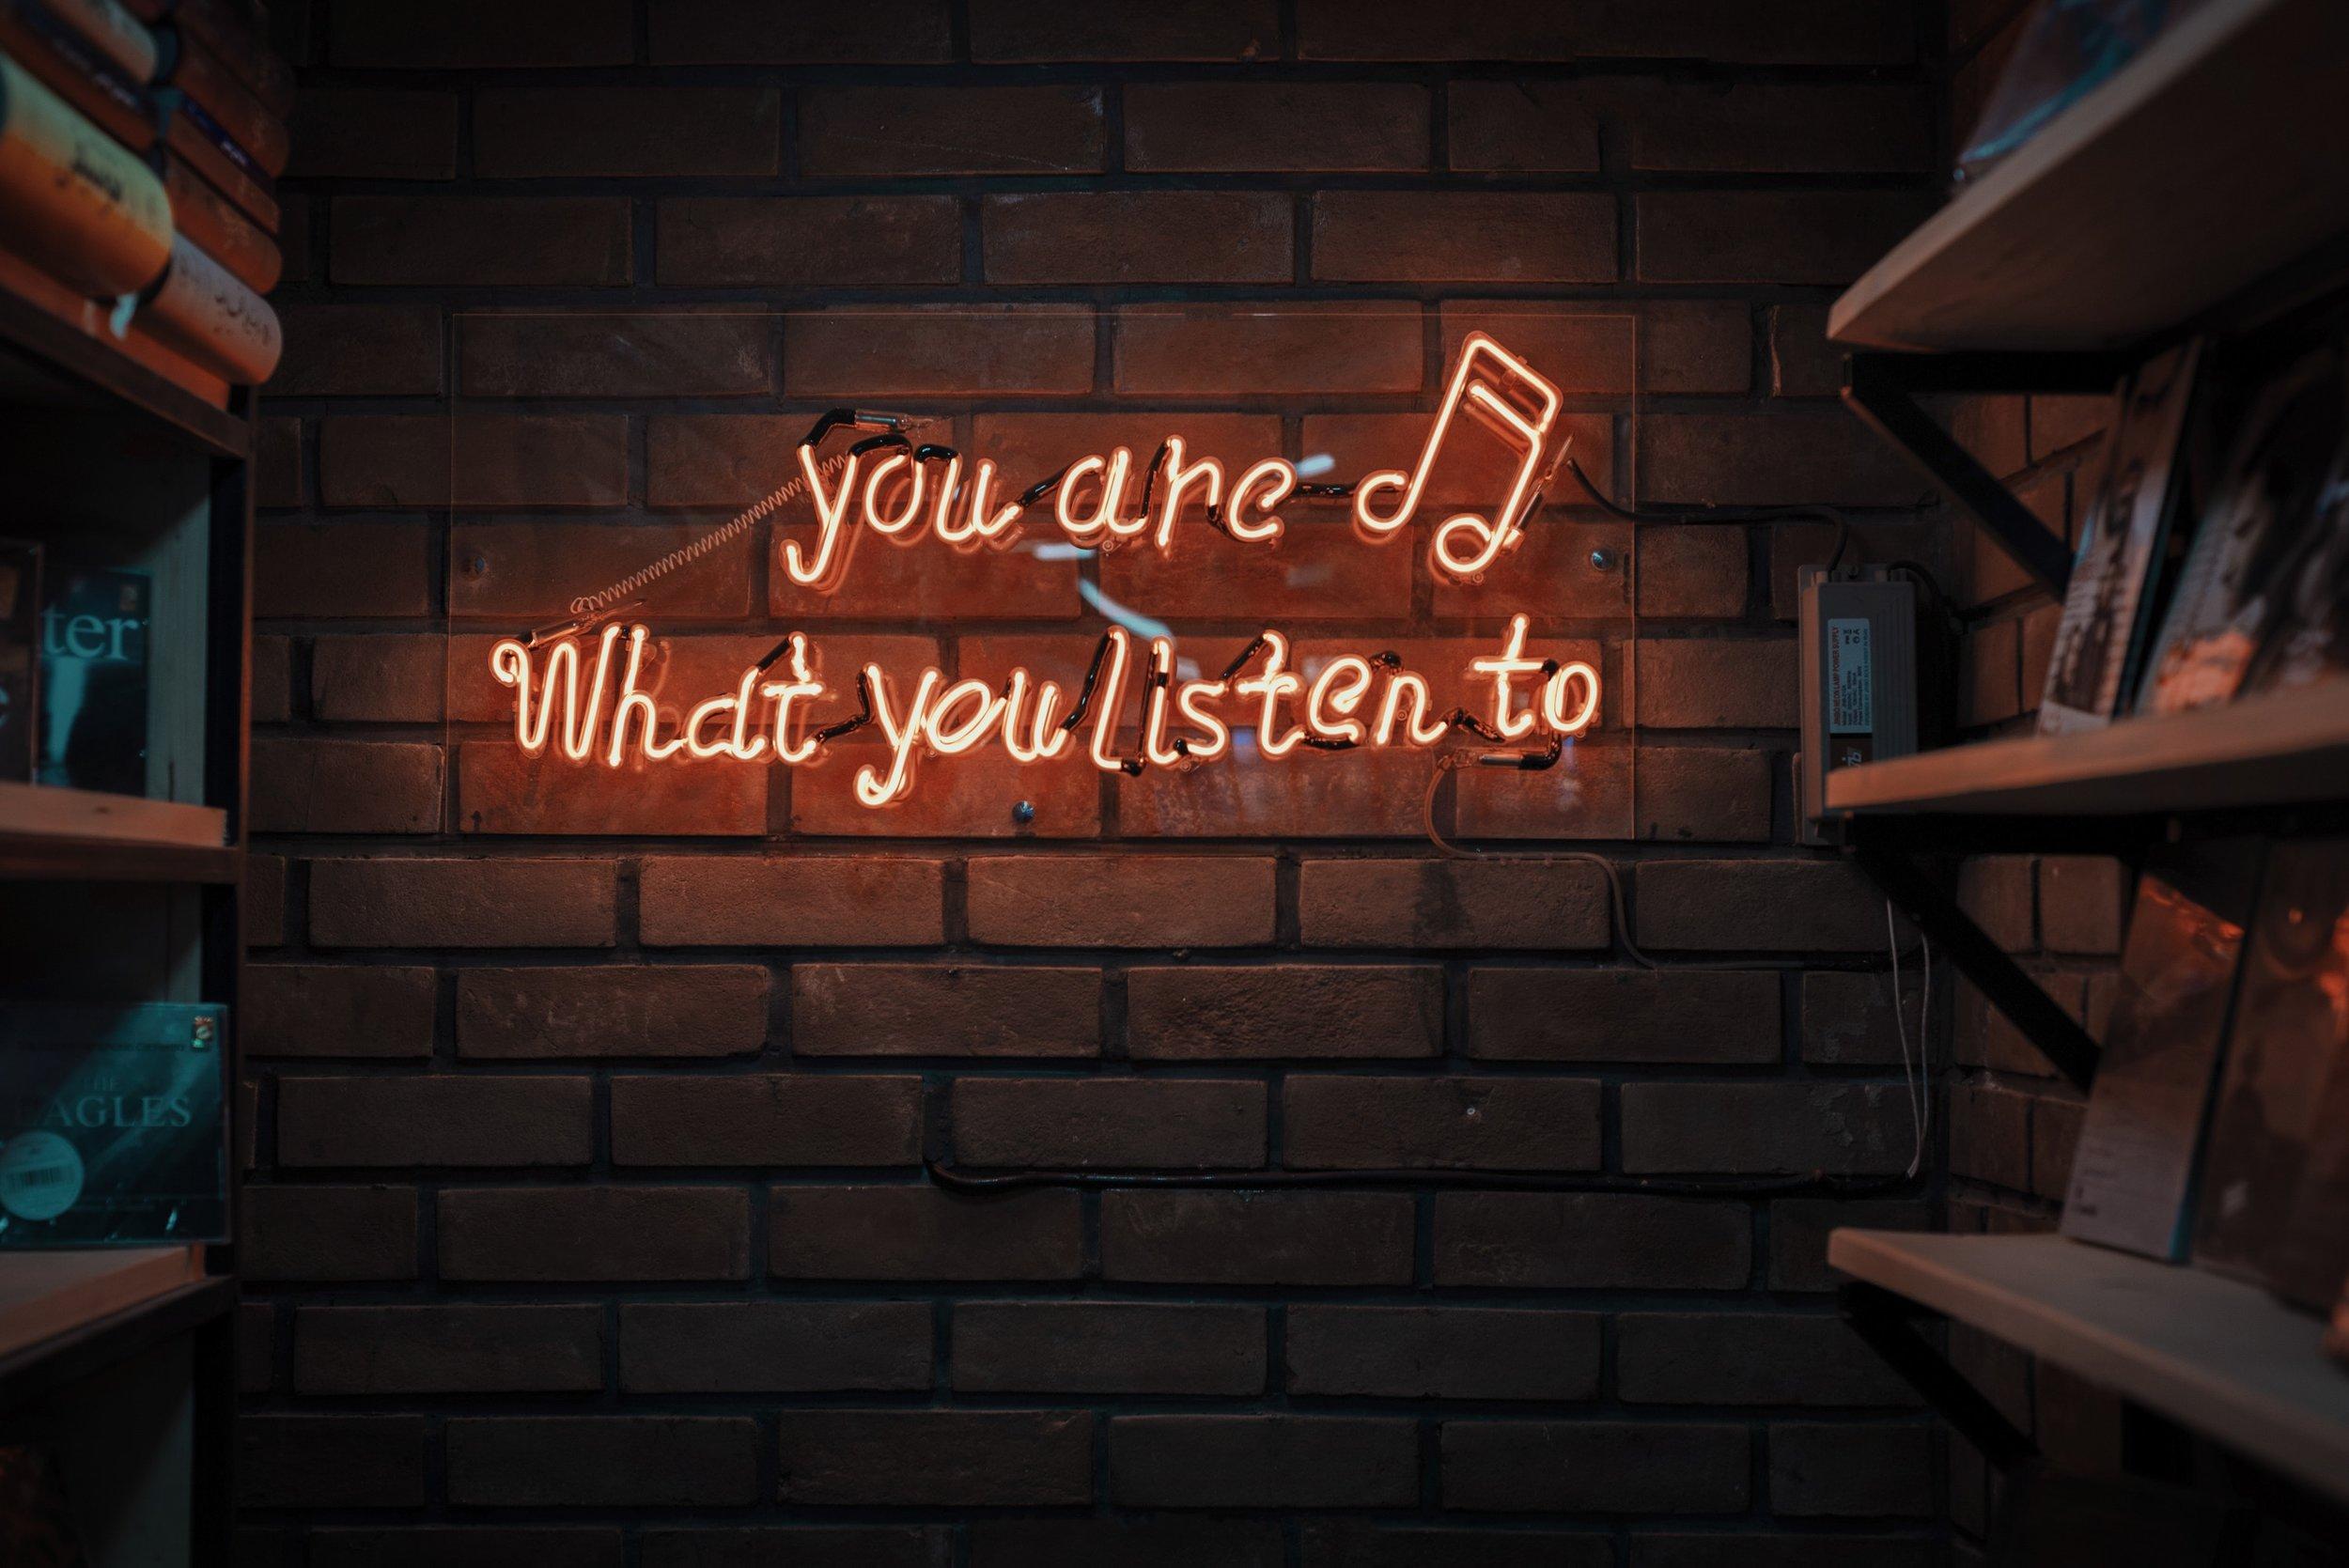 seems like a good idea to listen small.jpeg